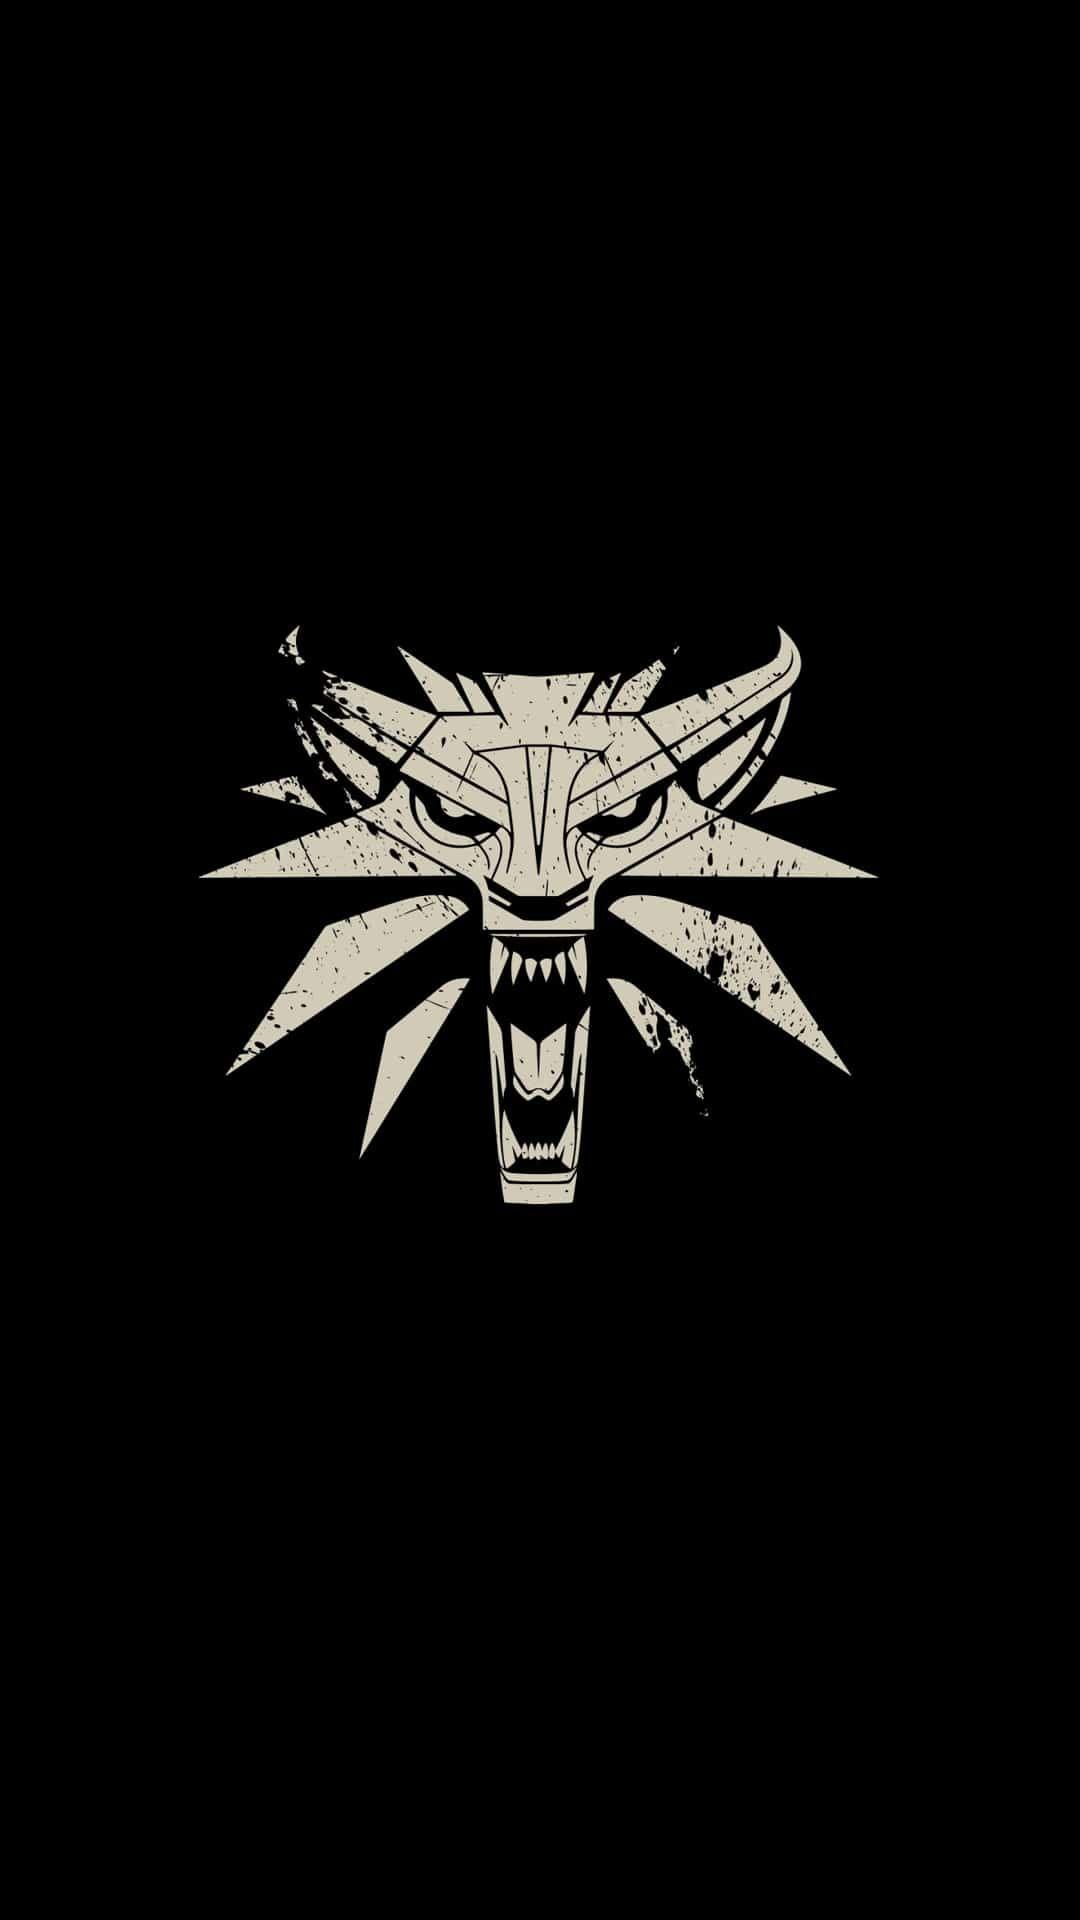 40+ Minimalist iPhone Backgrounds imagens) Witcher